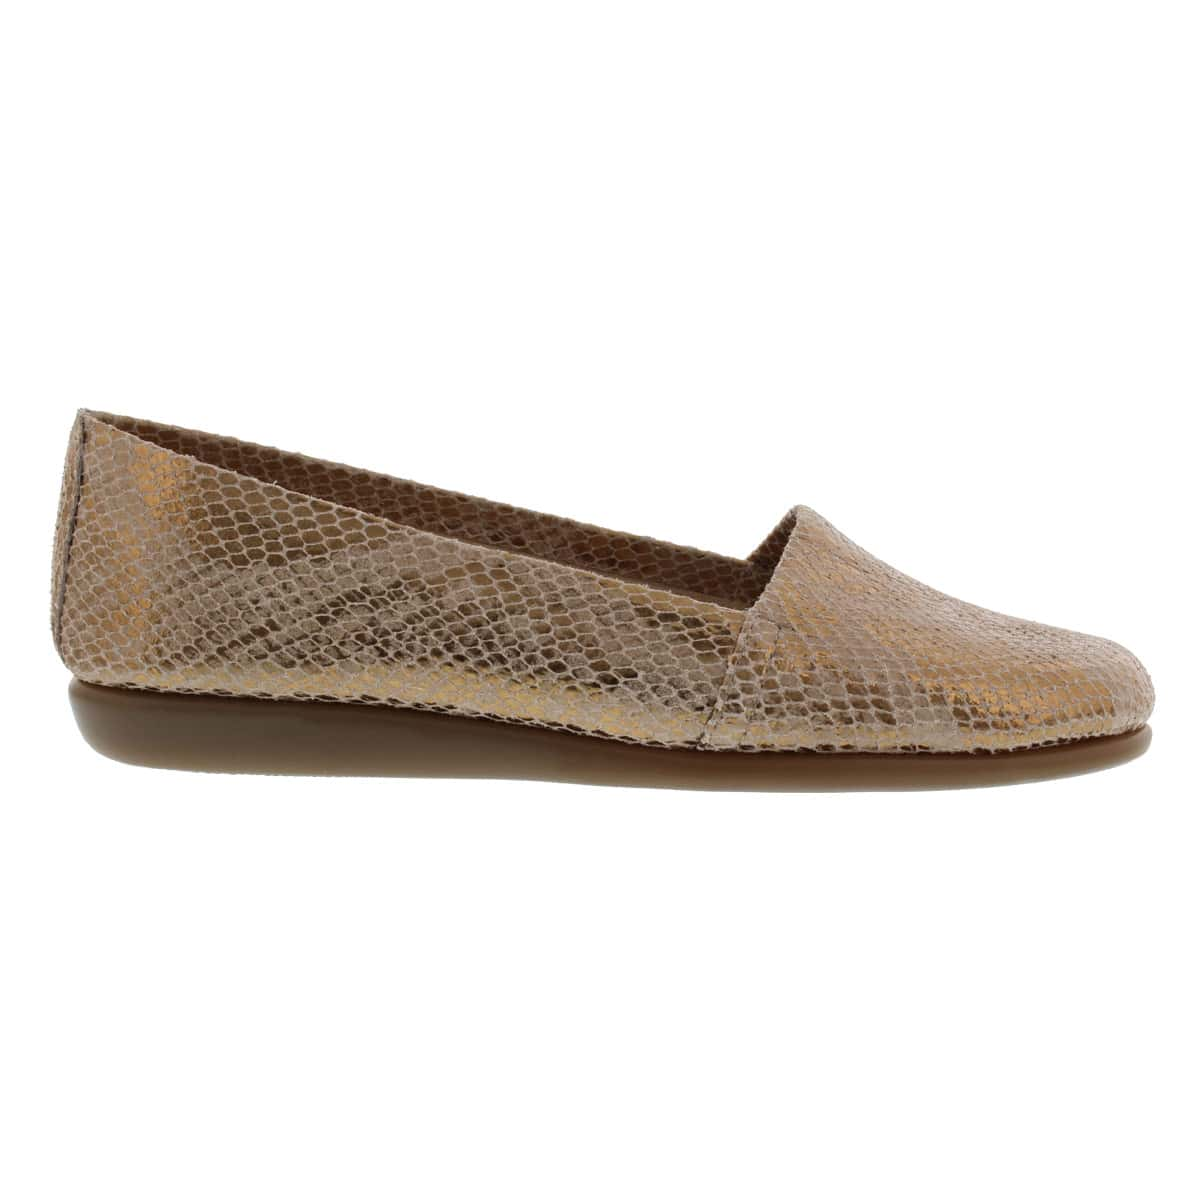 Lds Mr. Softee brz slip on casual shoe